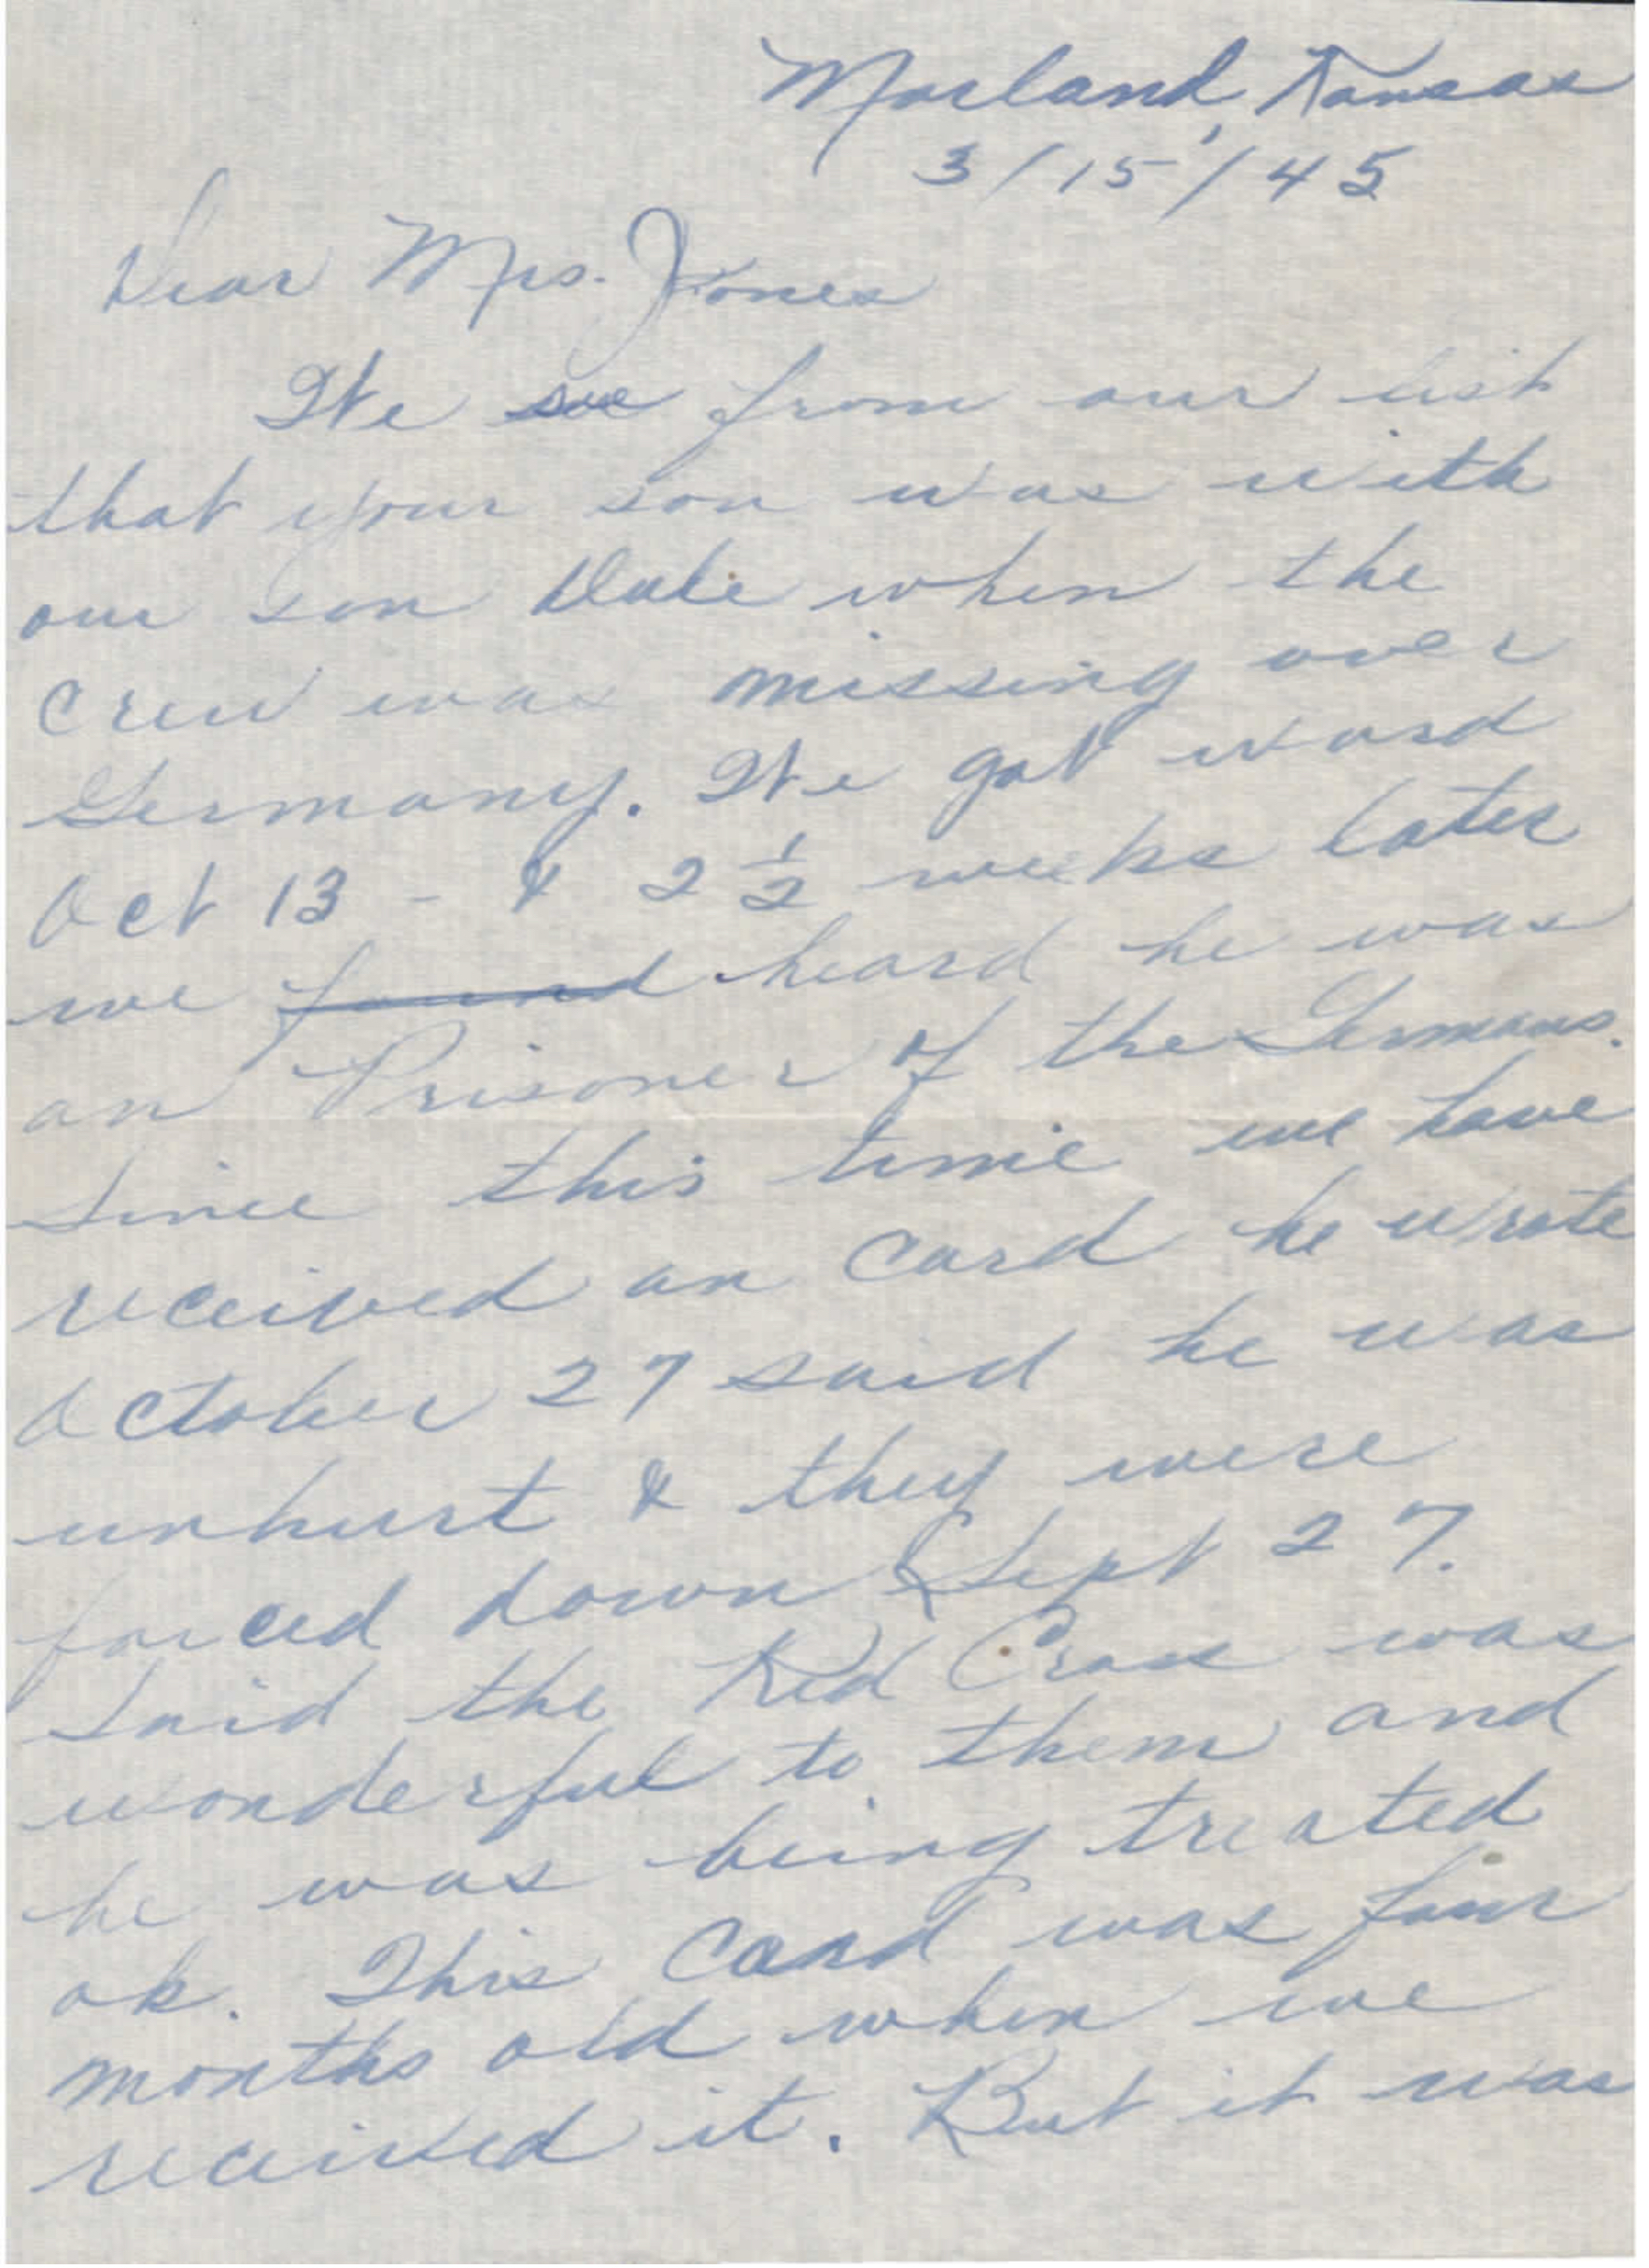 Maupin 3-15-1945 2.jpg